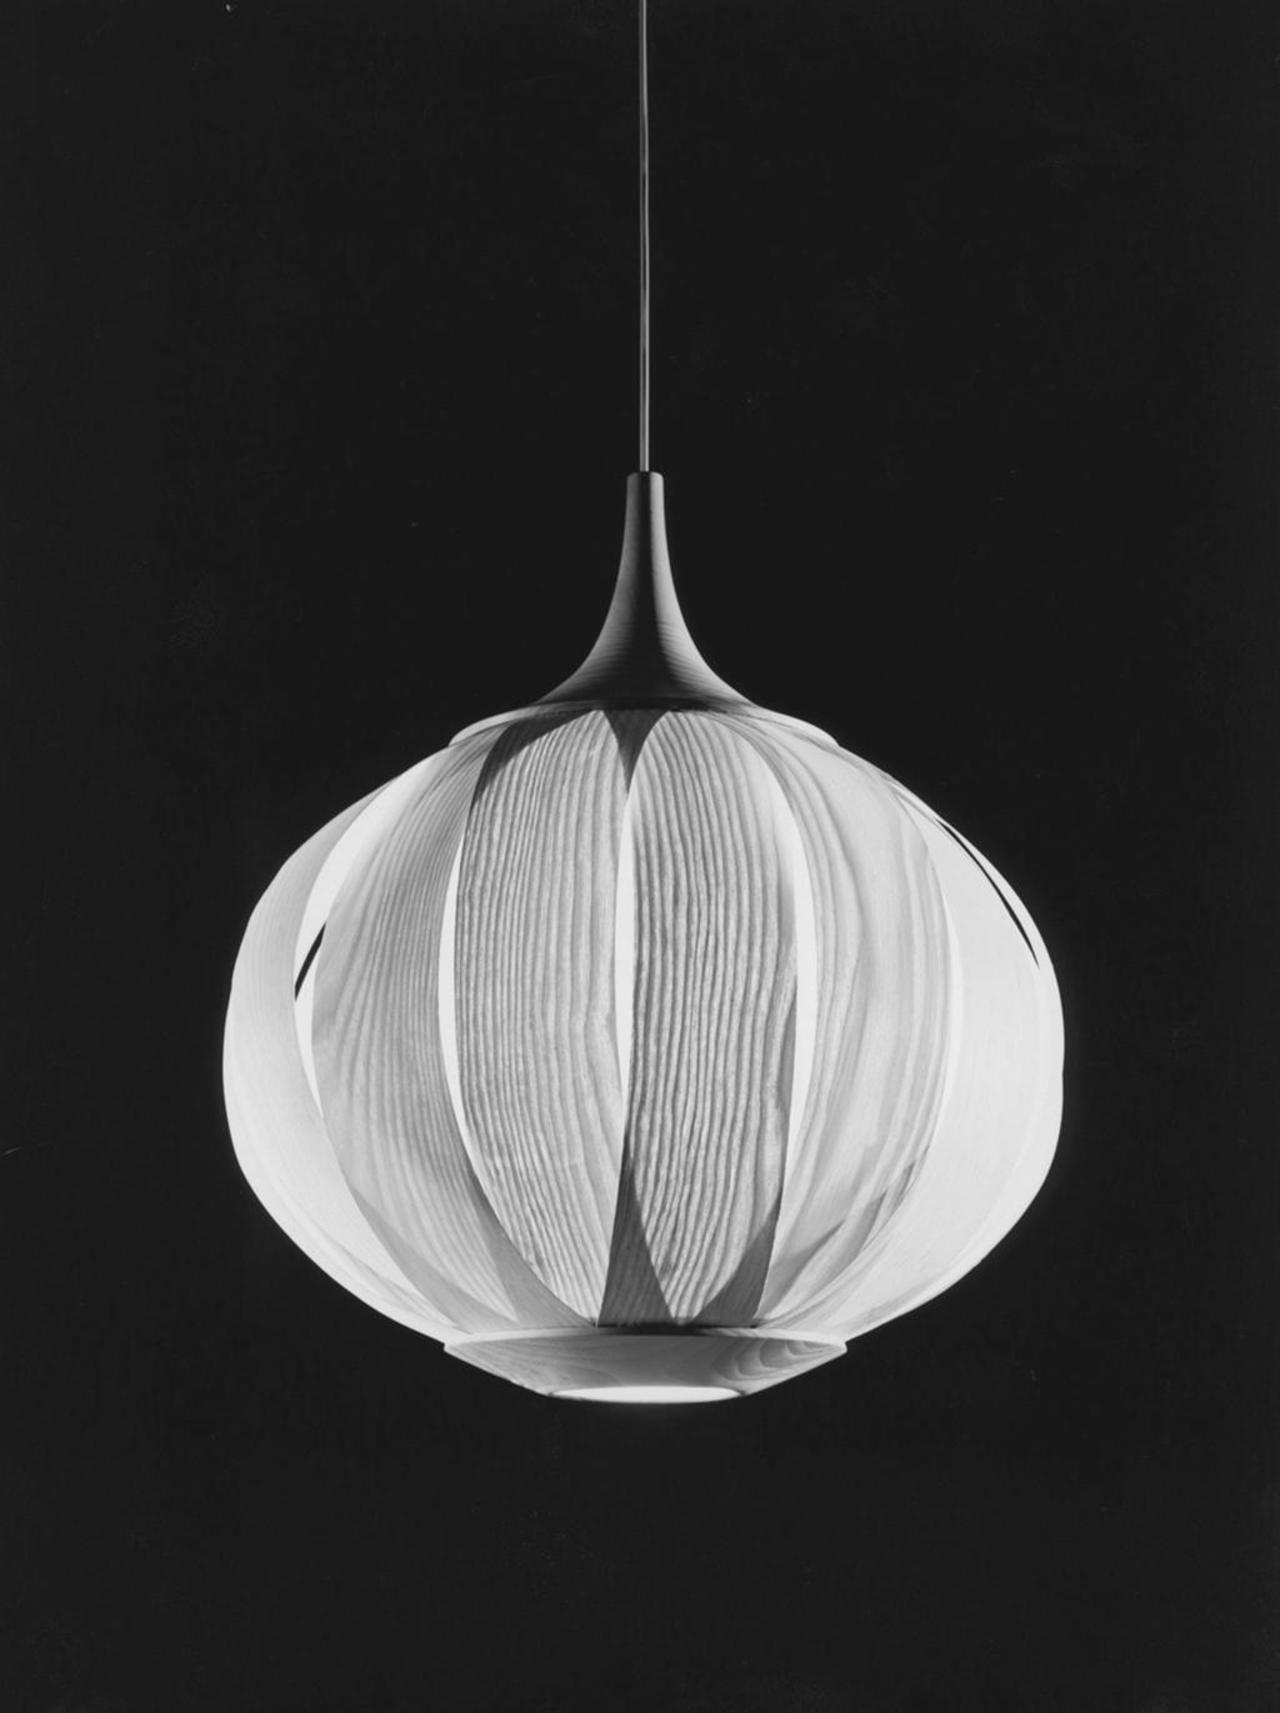 Ceiling lamp in black & white 1958